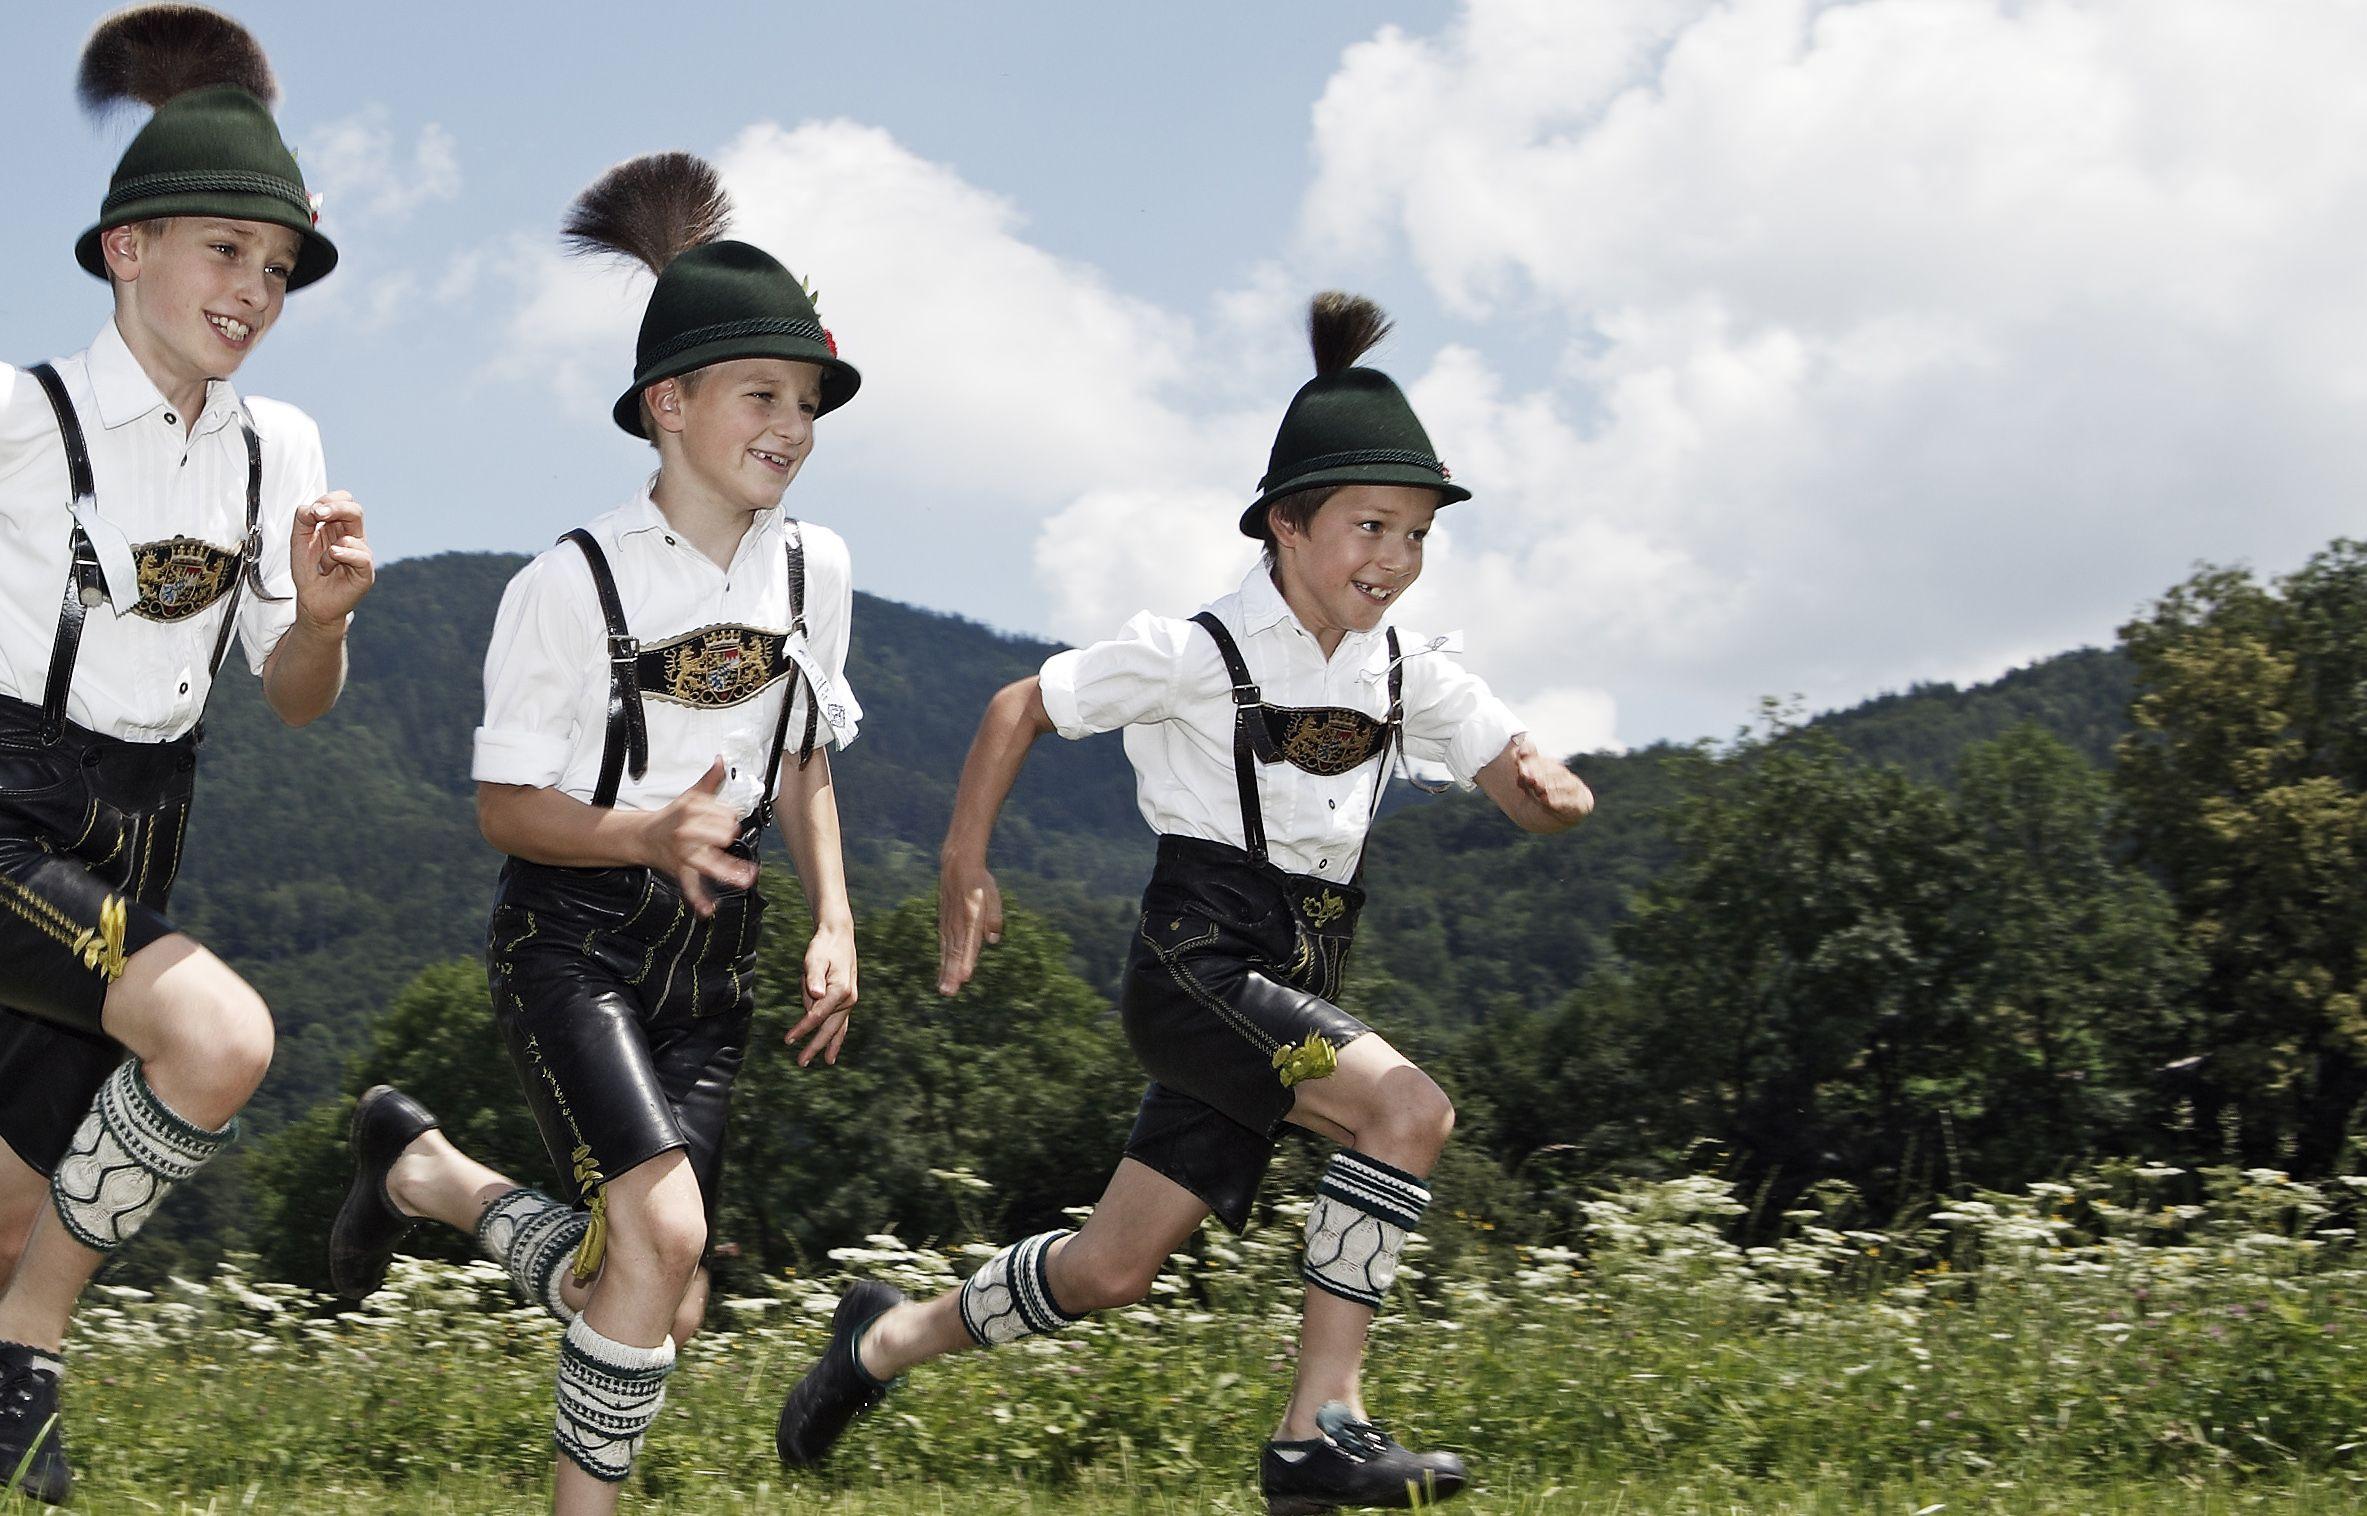 #Tracht #Lederhosen #Bayern